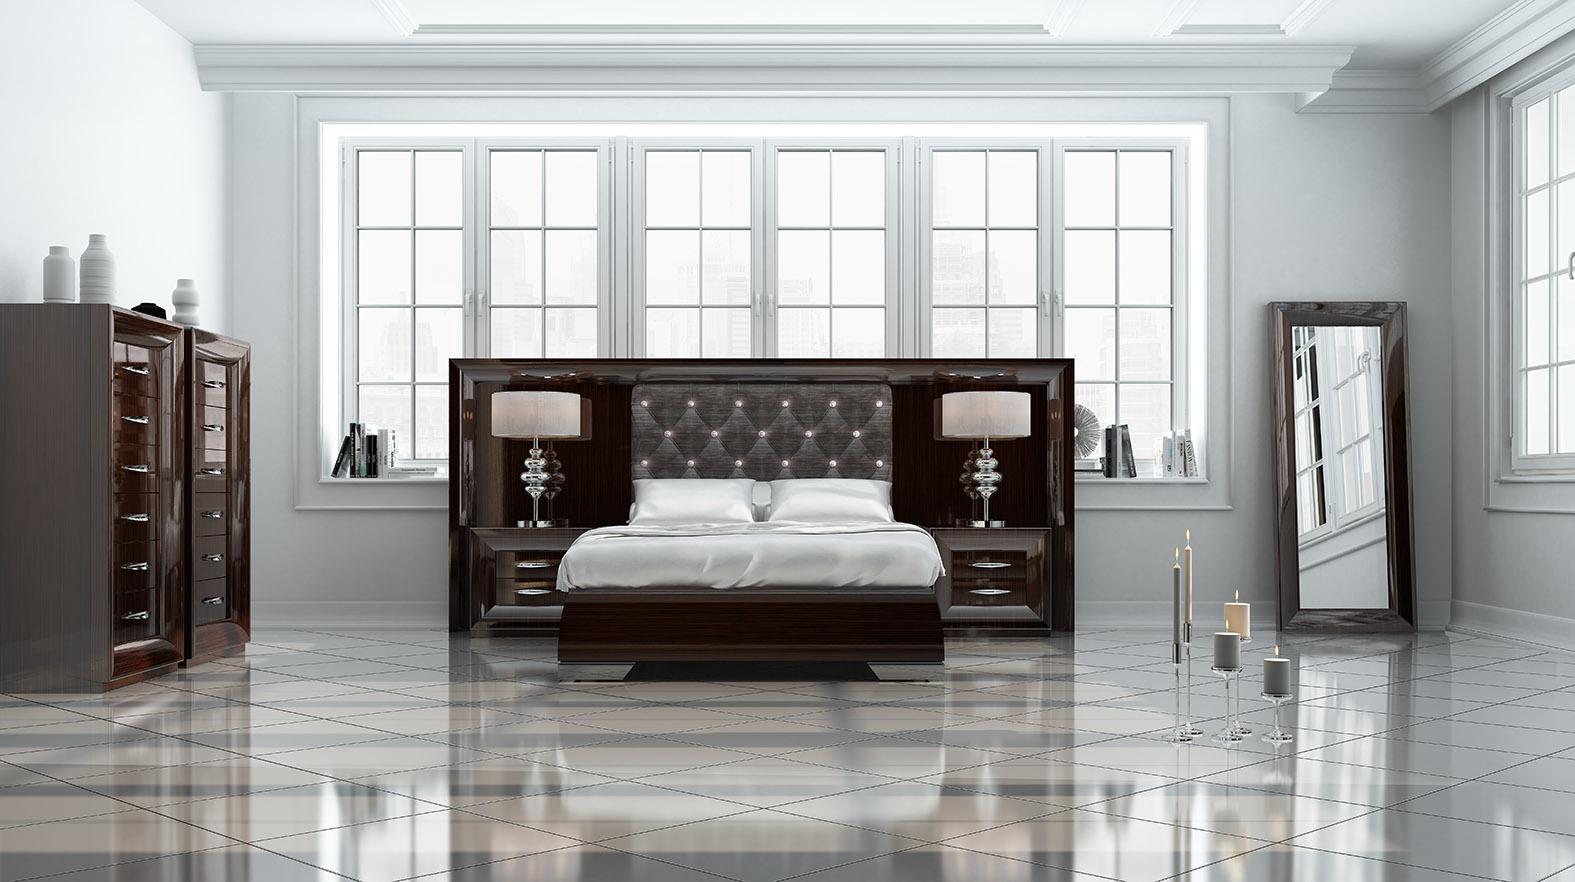 High End Modern Furniture: Extravagant Wood High End Contemporary Furniture